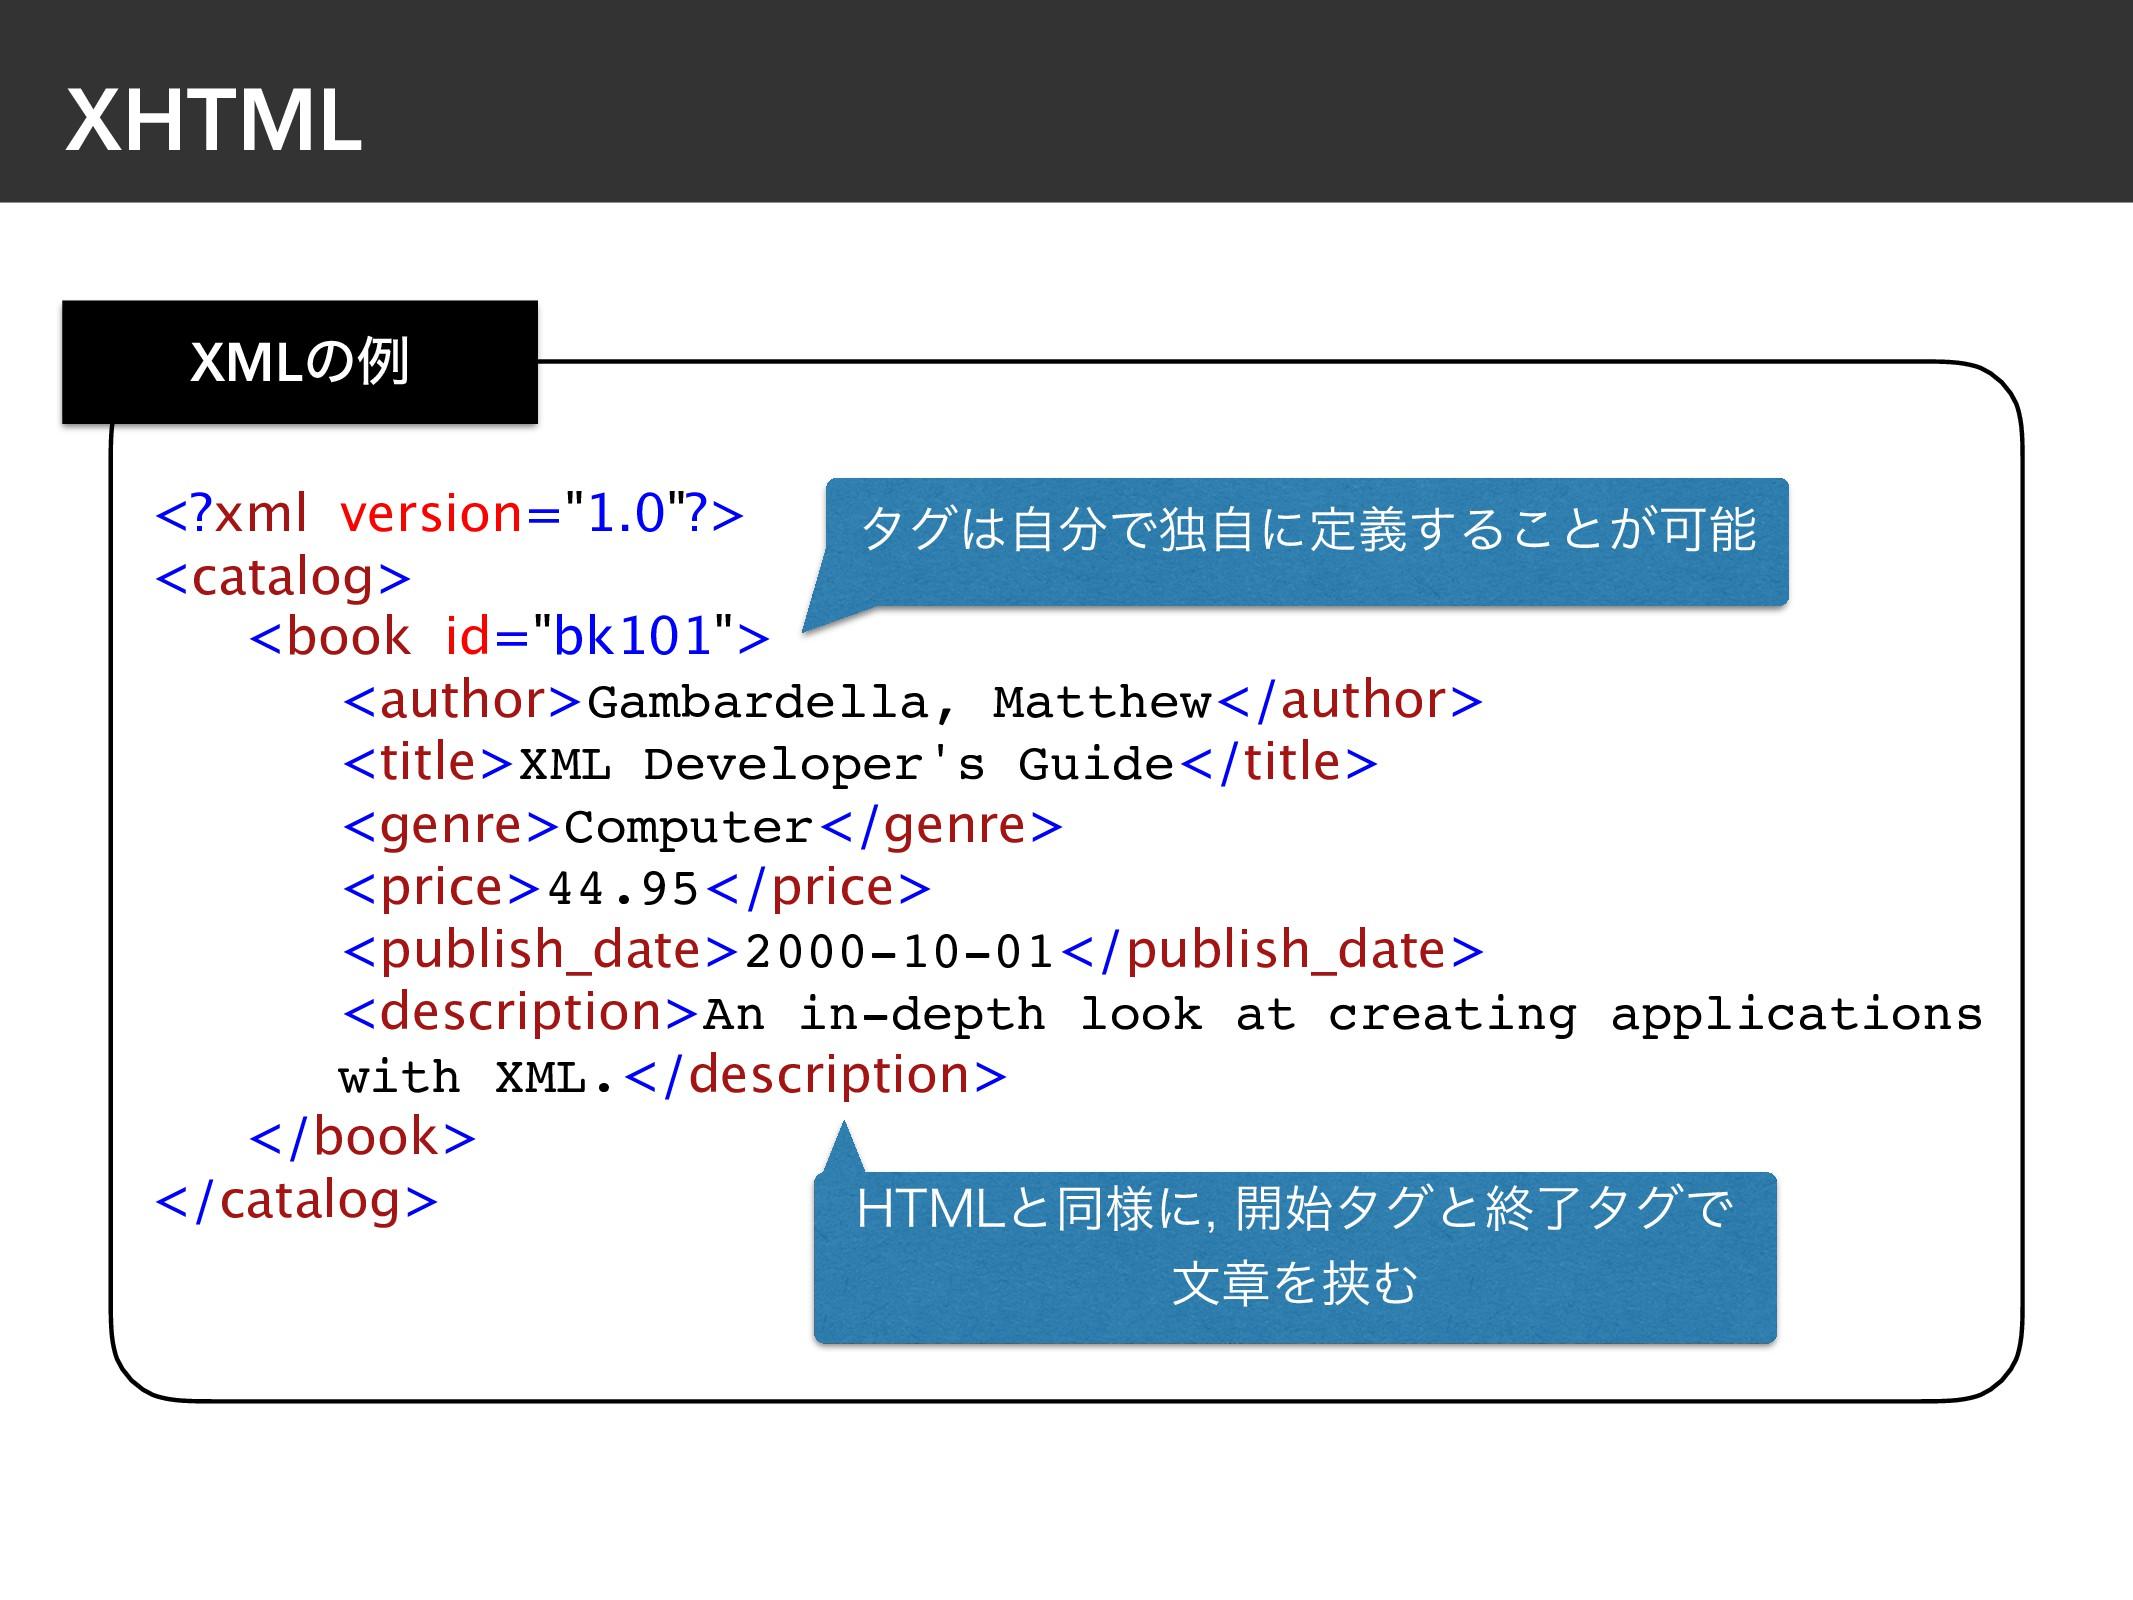 "XHTML <?xml version=""1.0""?> <catalog> <book id=..."